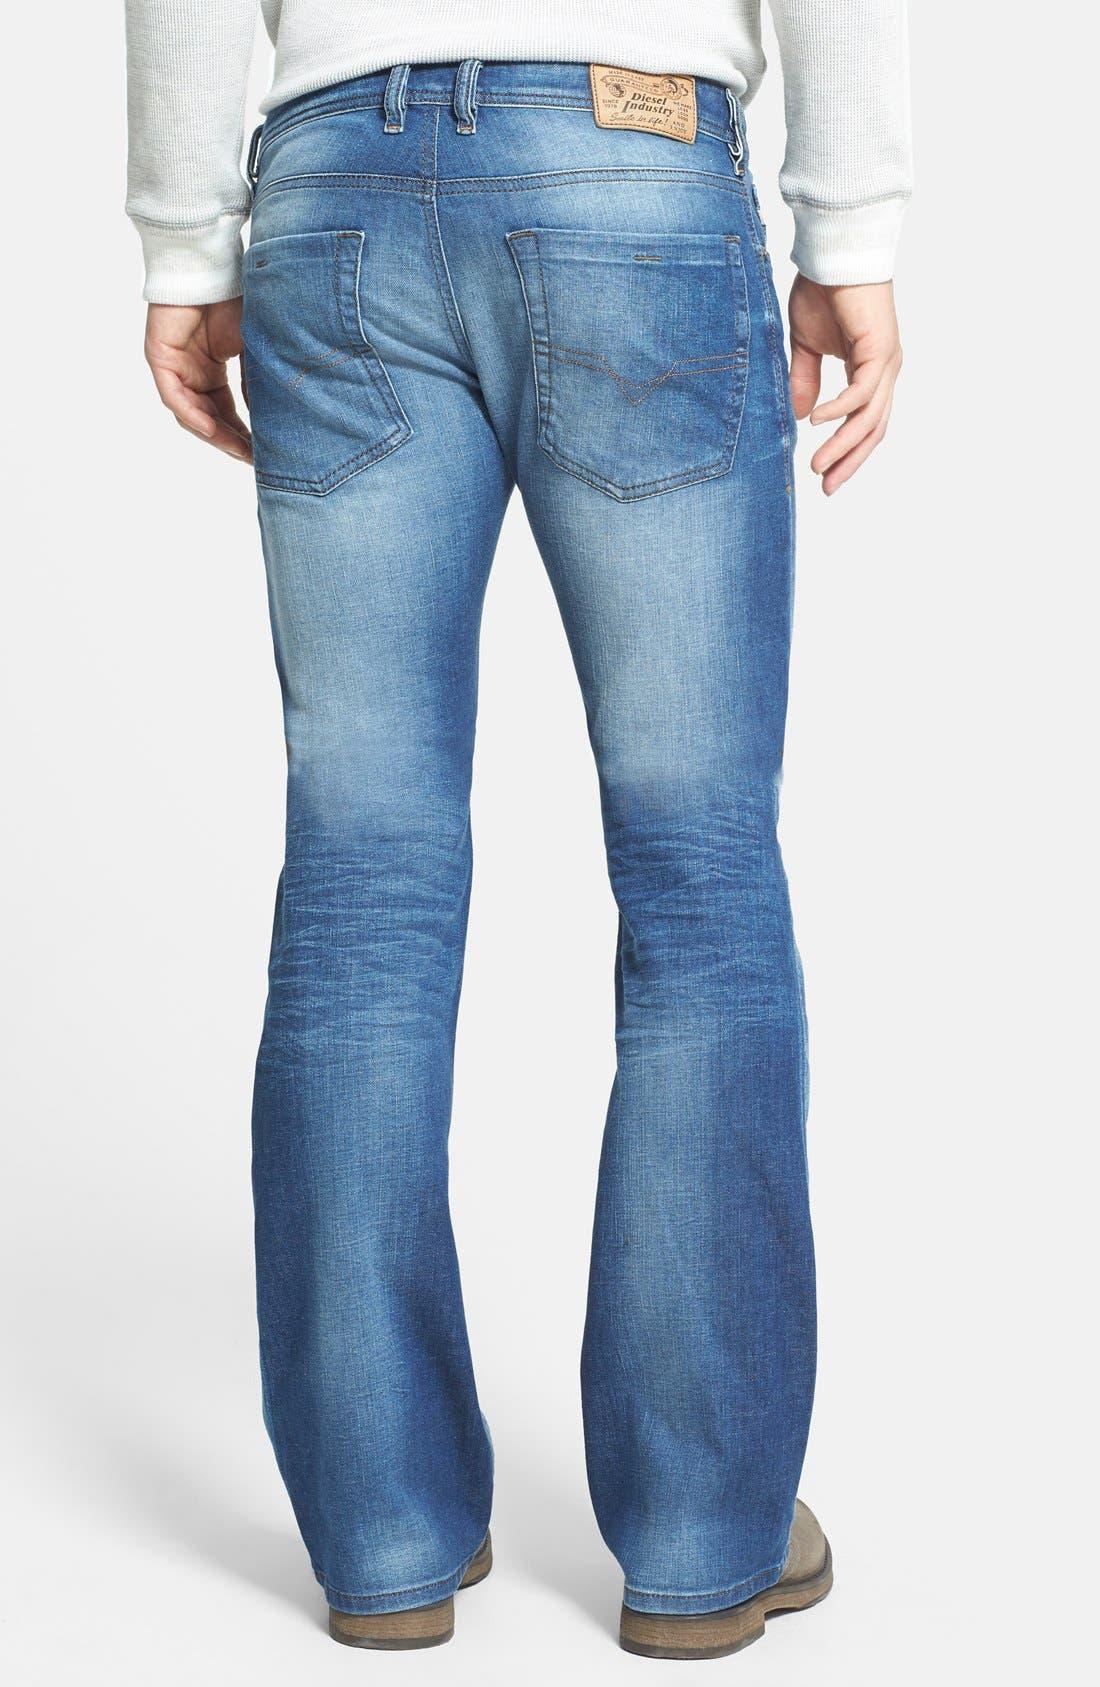 Zathan Bootcut Jeans,                             Alternate thumbnail 2, color,                             0831D